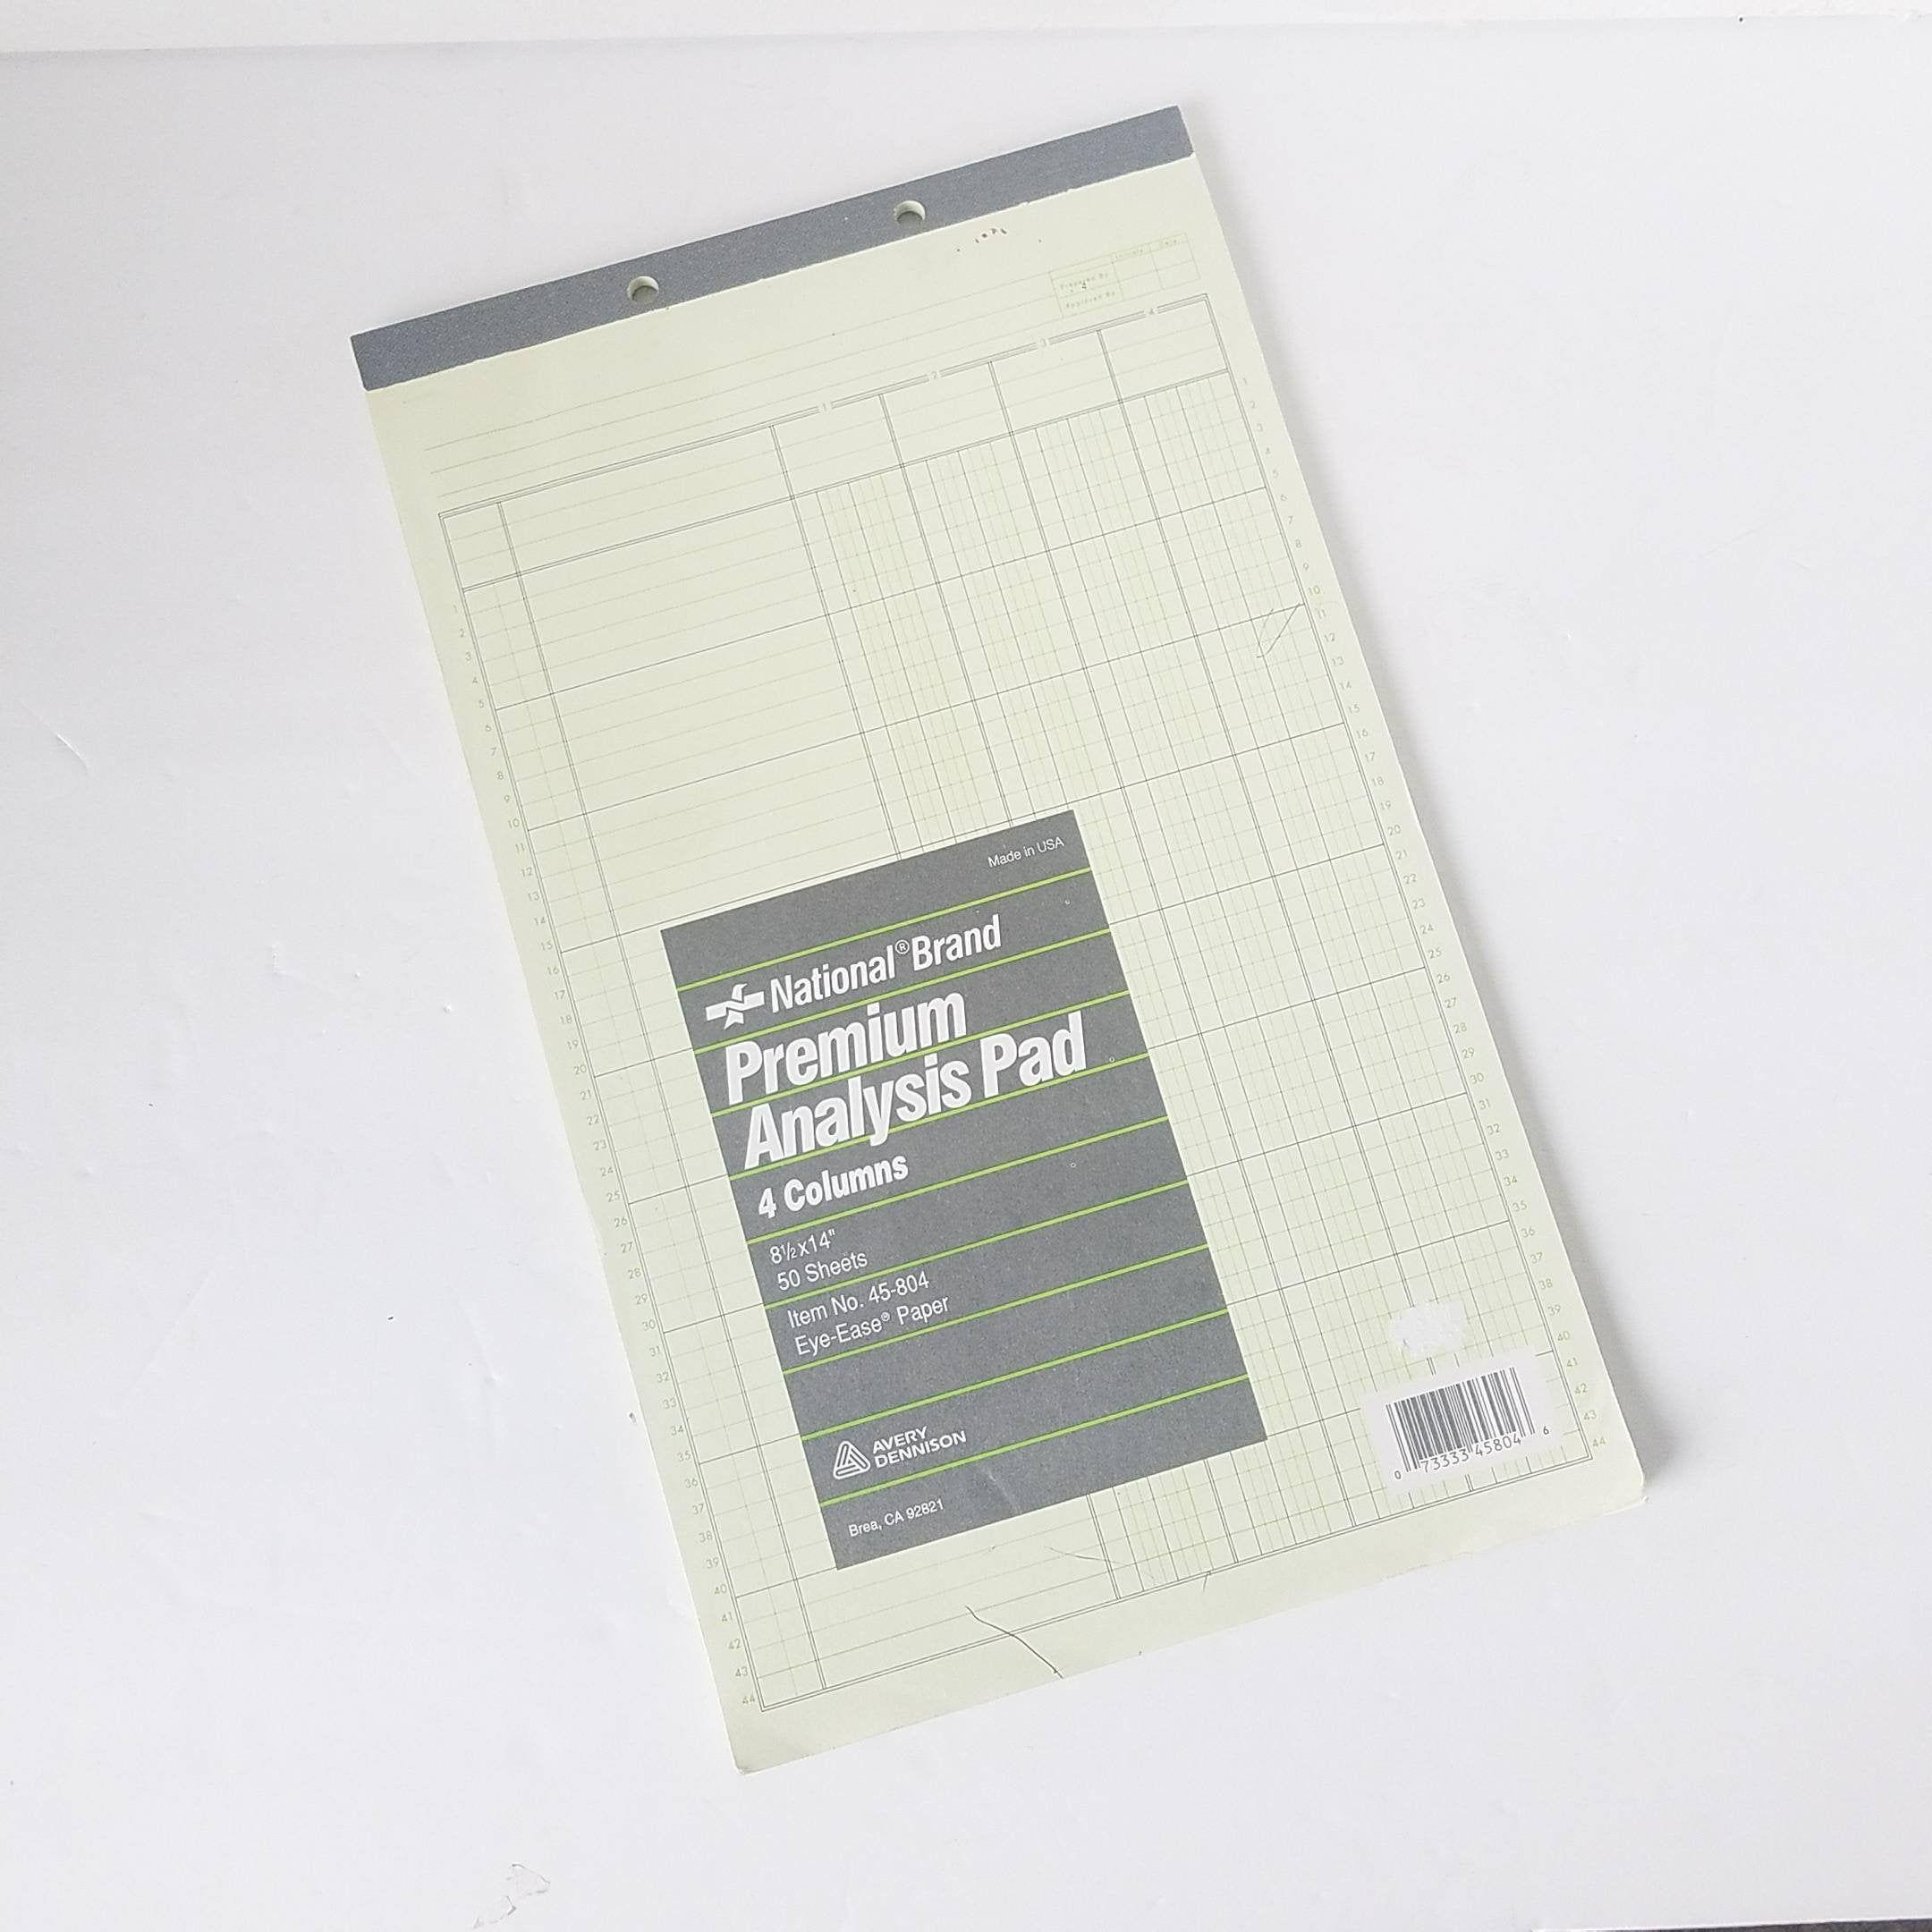 Vintage Analysis Pad Eye Ease National Junk Journal Old Paper Etsy In 2020 Old Paper Planner Vintage Junk Journal